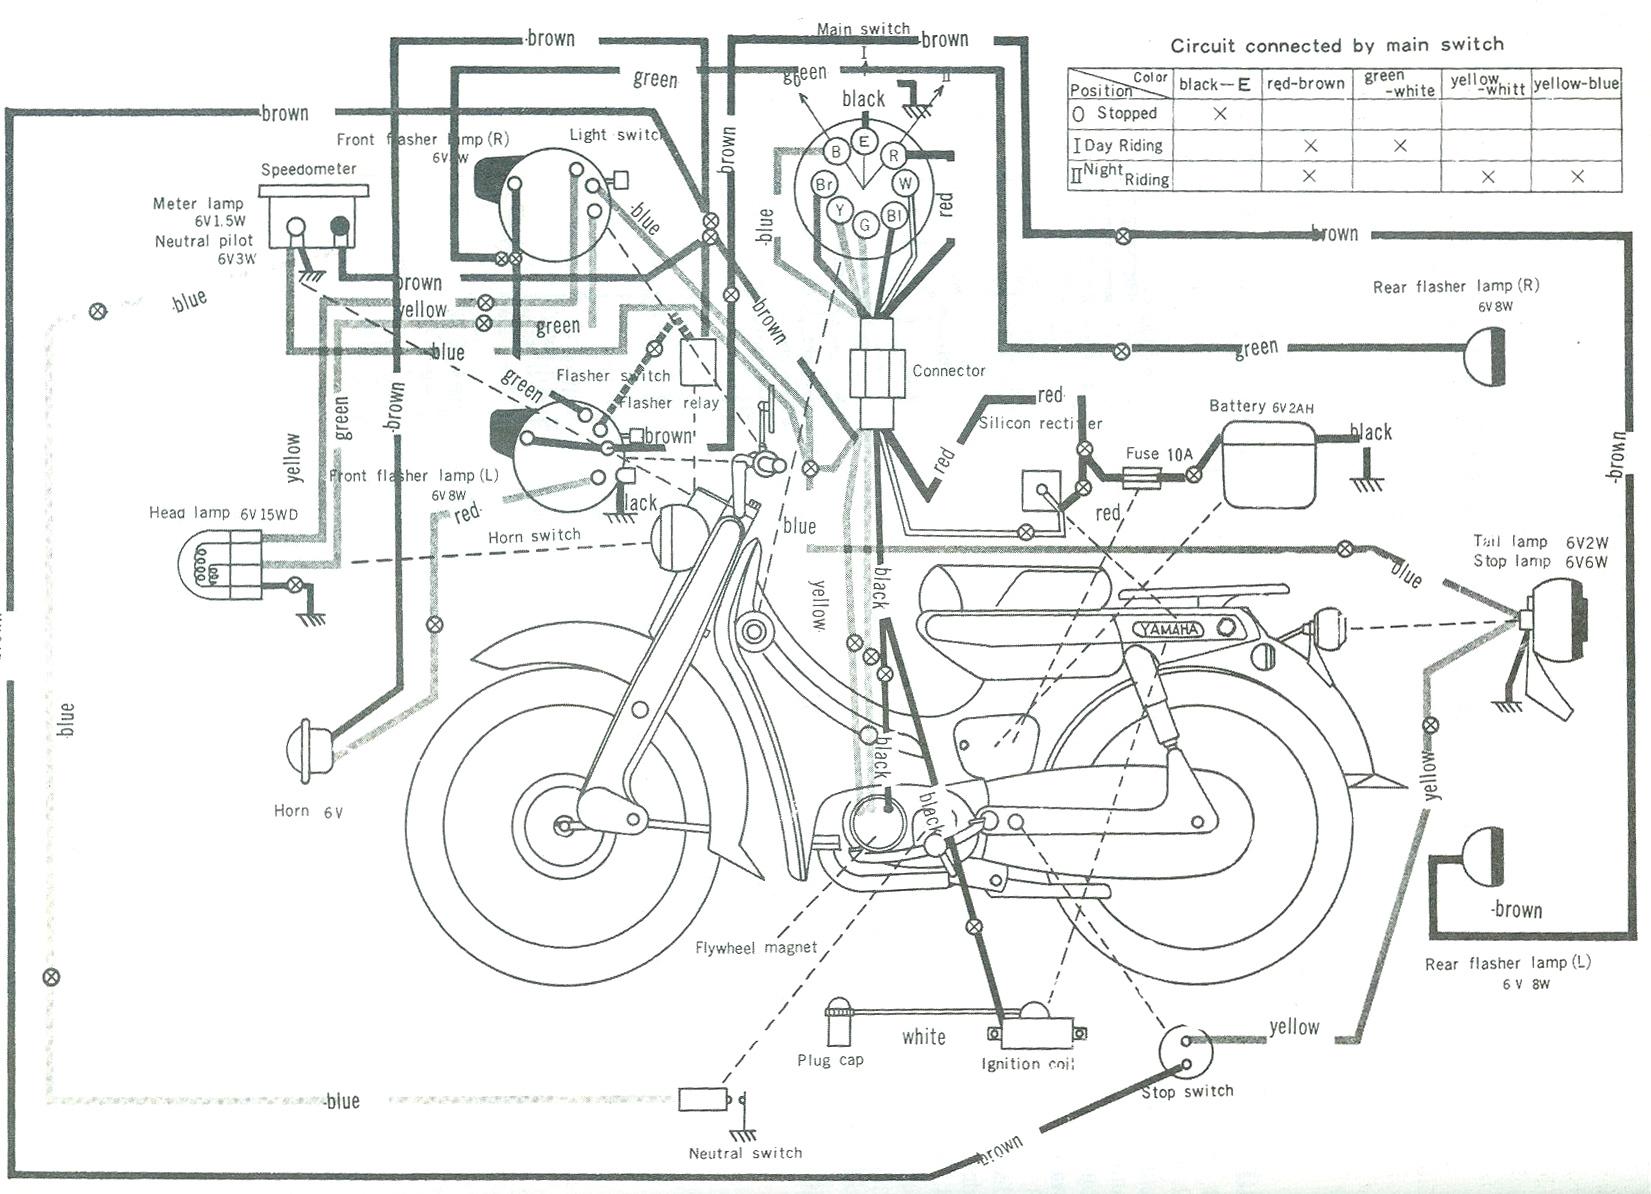 Unique yamaha aerox wiring diagram ornament best images for wiring yamaha aerox 50cc wiring diagram yamaha jog cairearts jzgreentown cheapraybanclubmaster Image collections